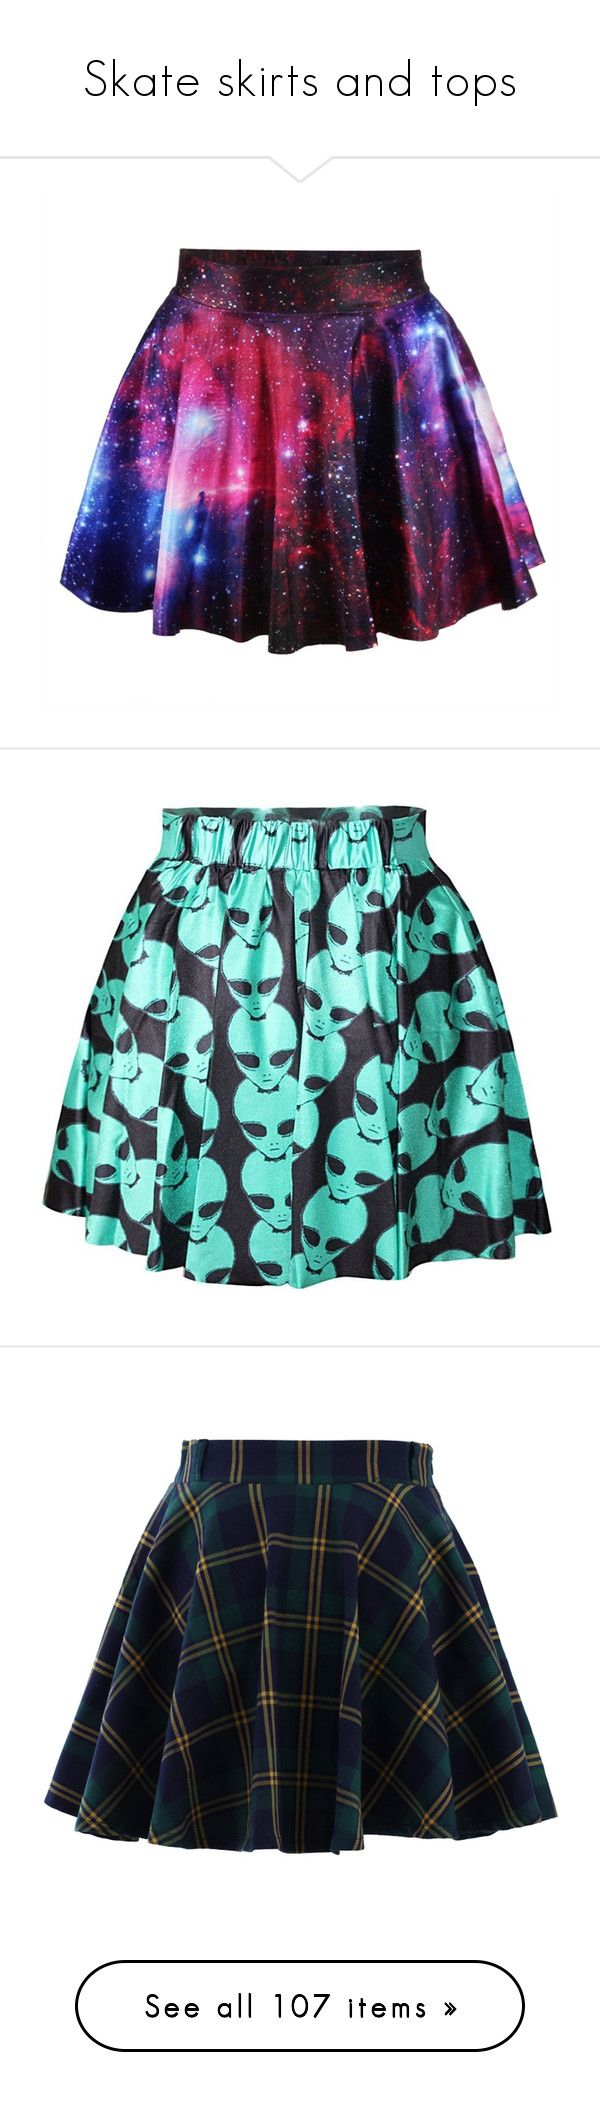 """Skate skirts and tops"" by neverland-is-just-a-dream-away ❤ liked on Polyvore featuring skirts, bottoms, gonne, skater skirt, galaxy skater skirt, flare skirt, purple skirt, cosmic skirt, saias and blue skater skirt"